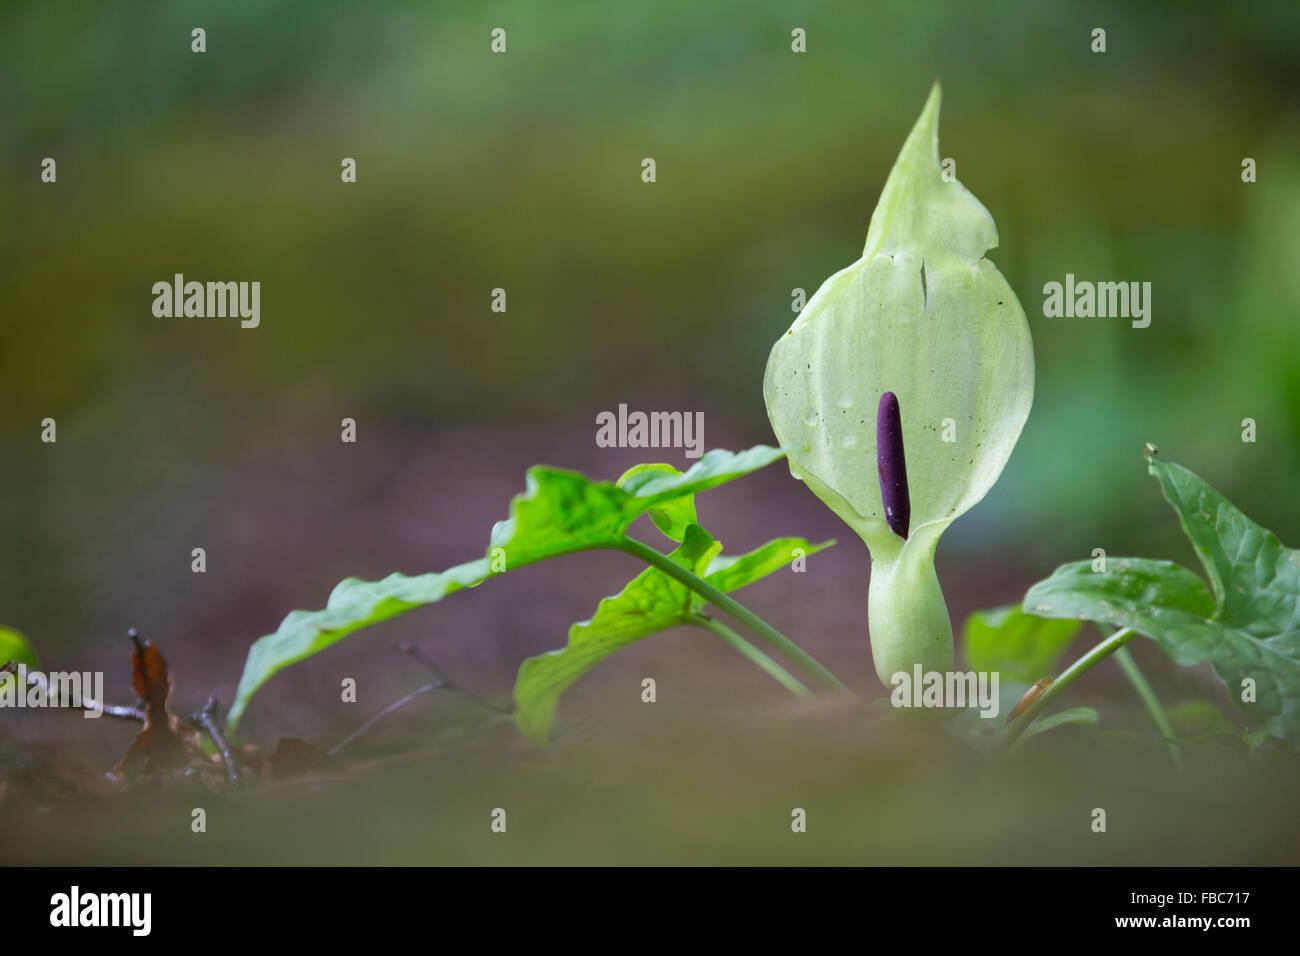 Cuckoo Pint; Arum maculatum Spadix; Cornwall; UK - Stock Image